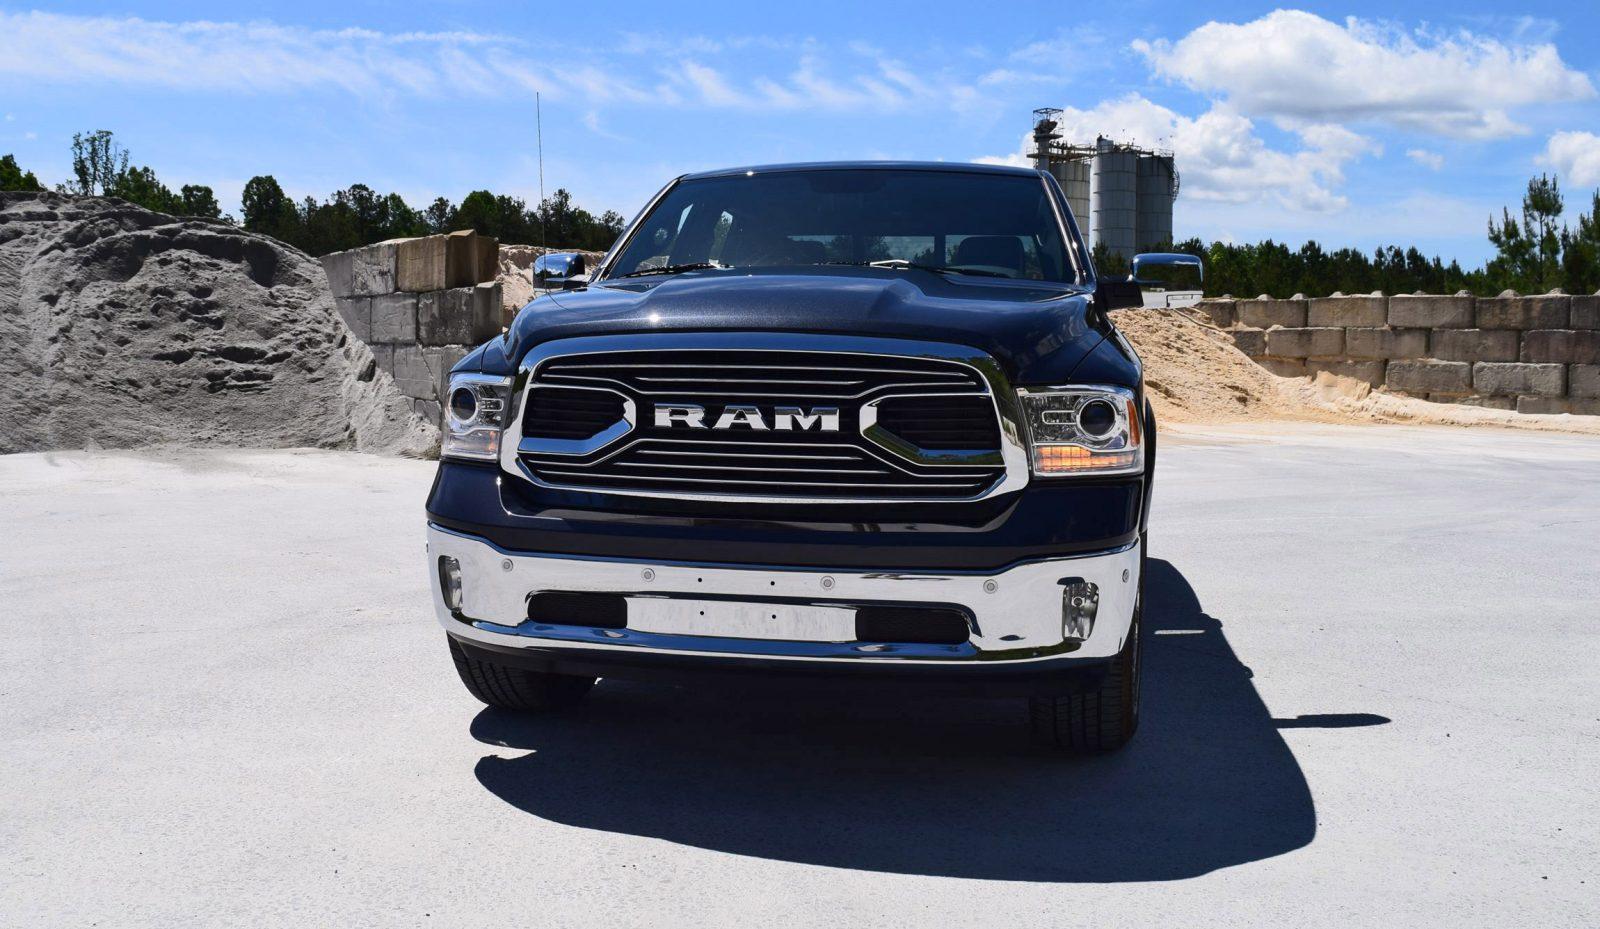 2016 RAM 1500 LIMITED EcoDiesel BLACK 1